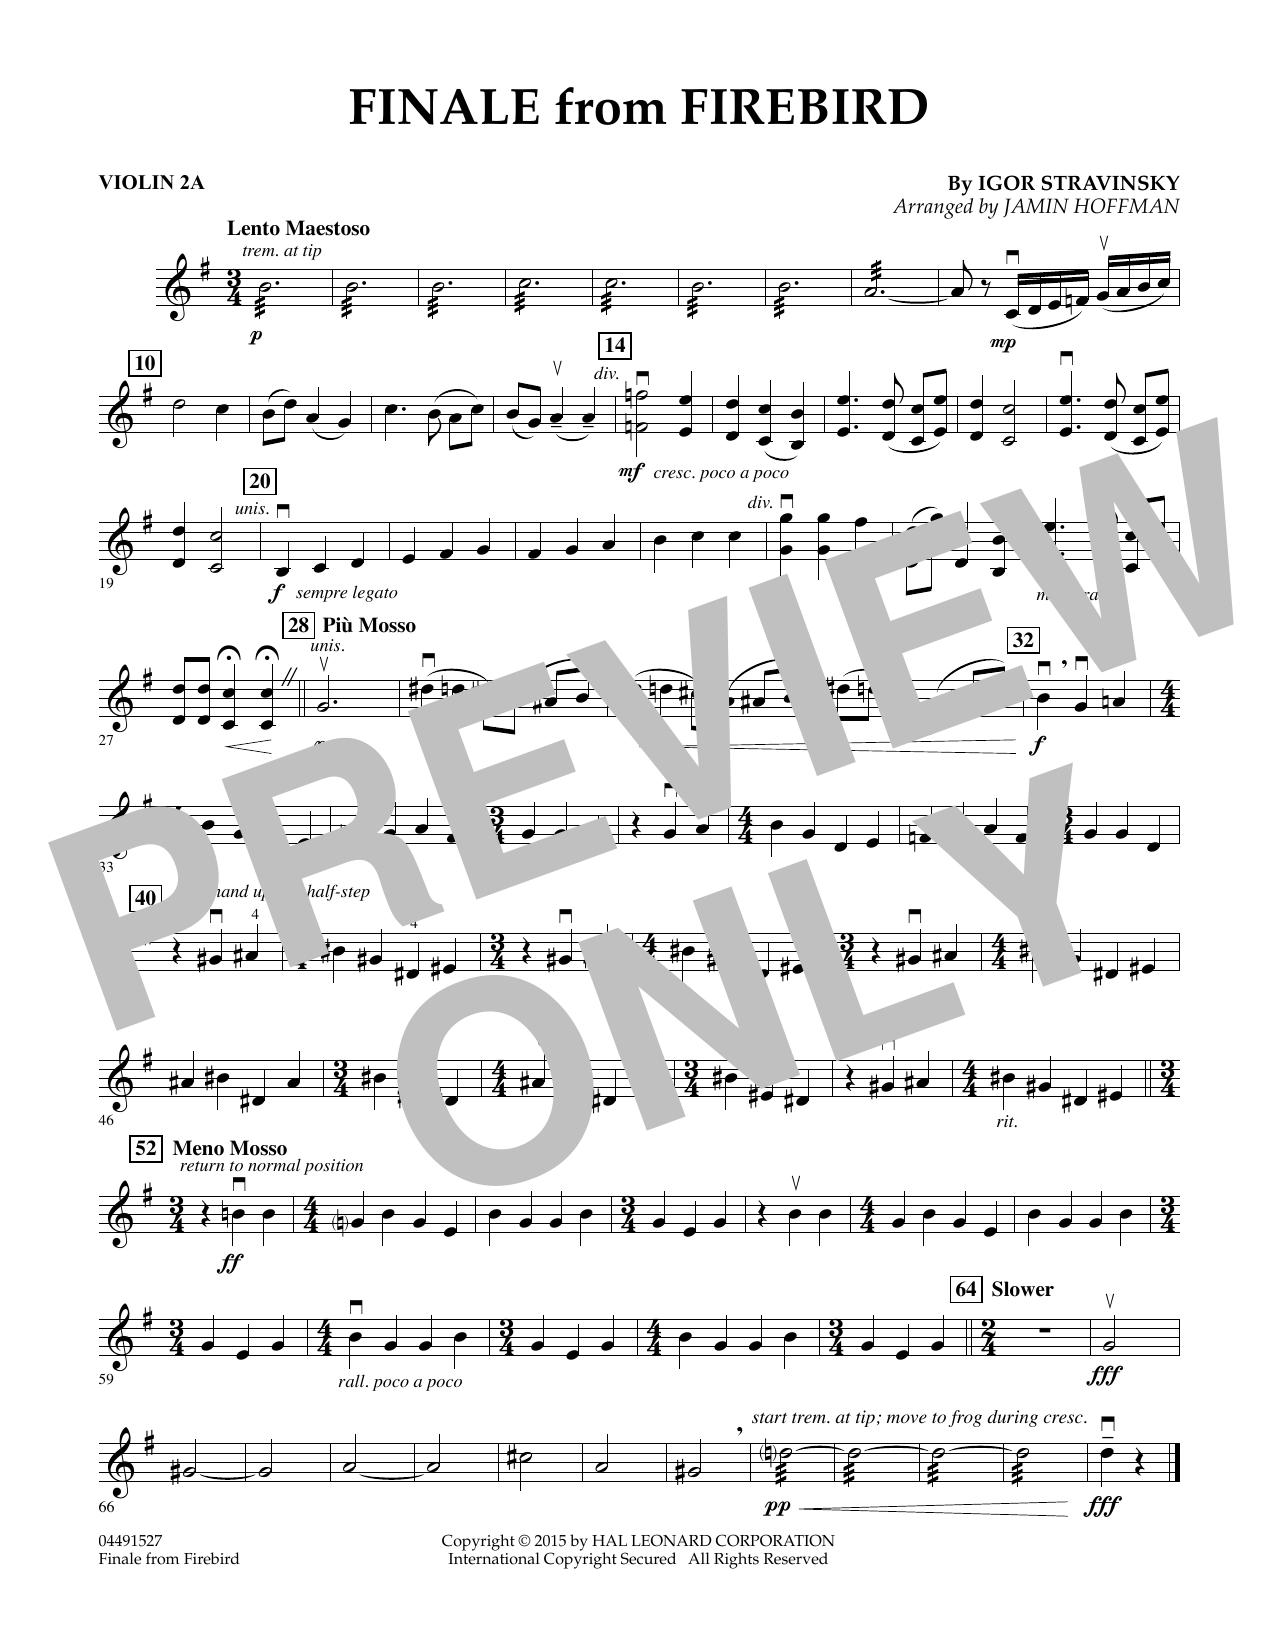 Finale from Firebird (arr. Jamin Hoffman) - Violin 2A (Orchestra)